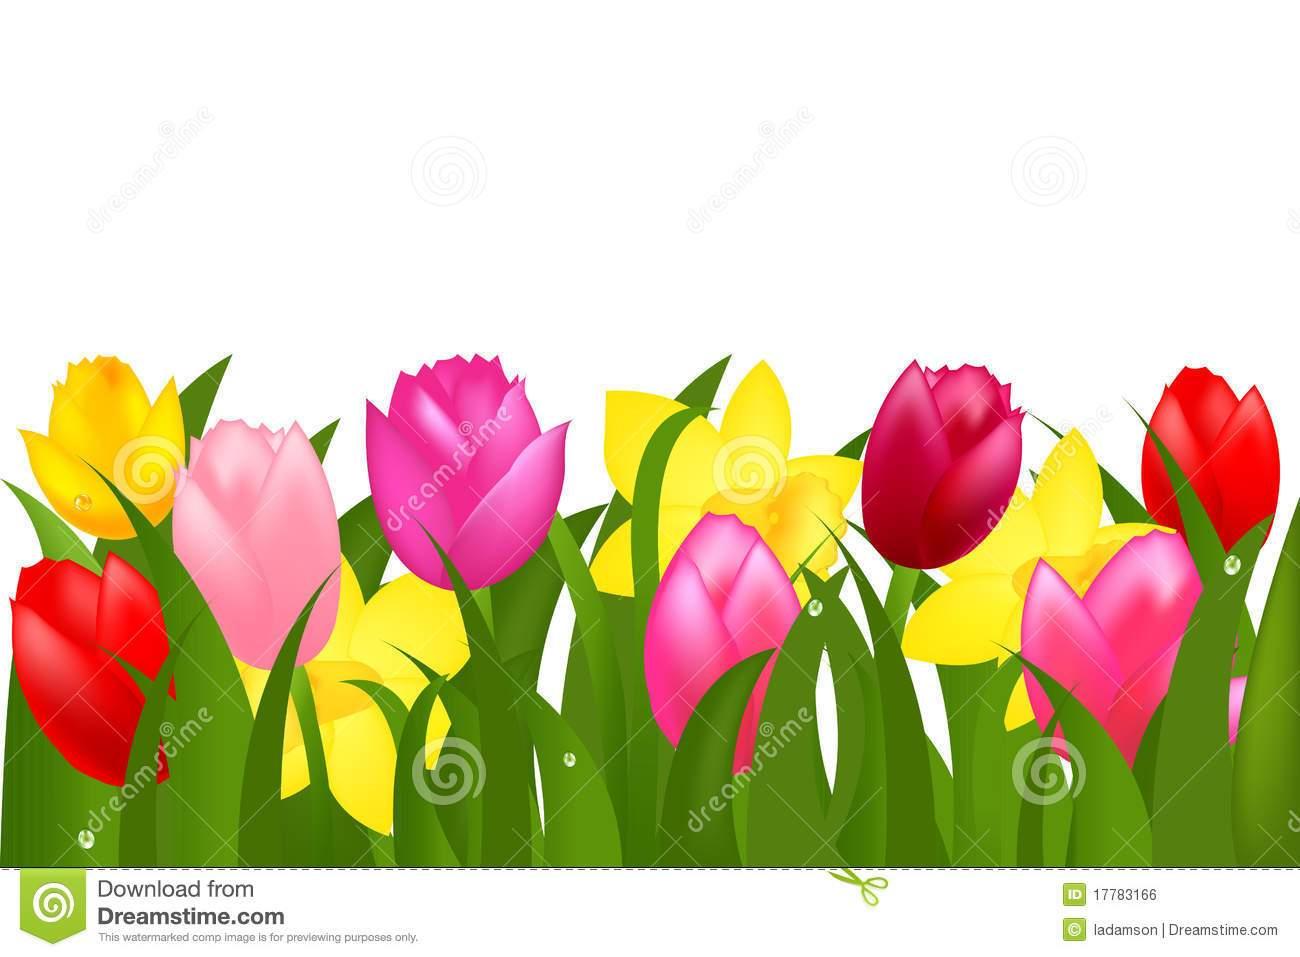 Tulip border clipart 3 » Clipart Portal.